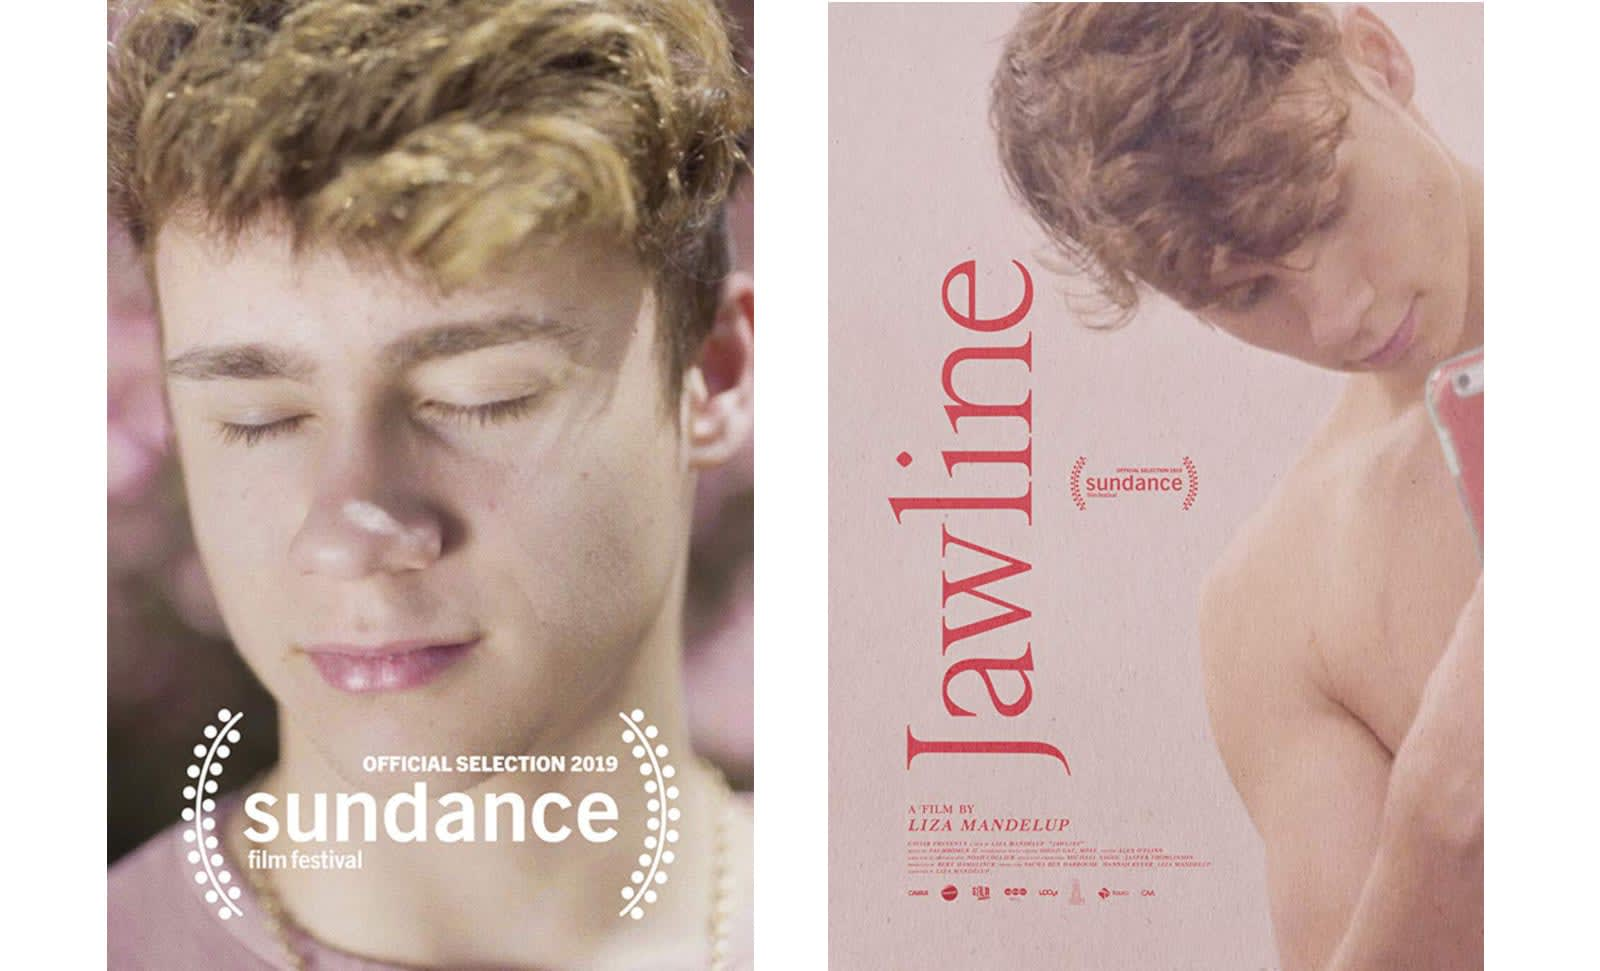 Hulu snaps up award-winning social media influencer documentary